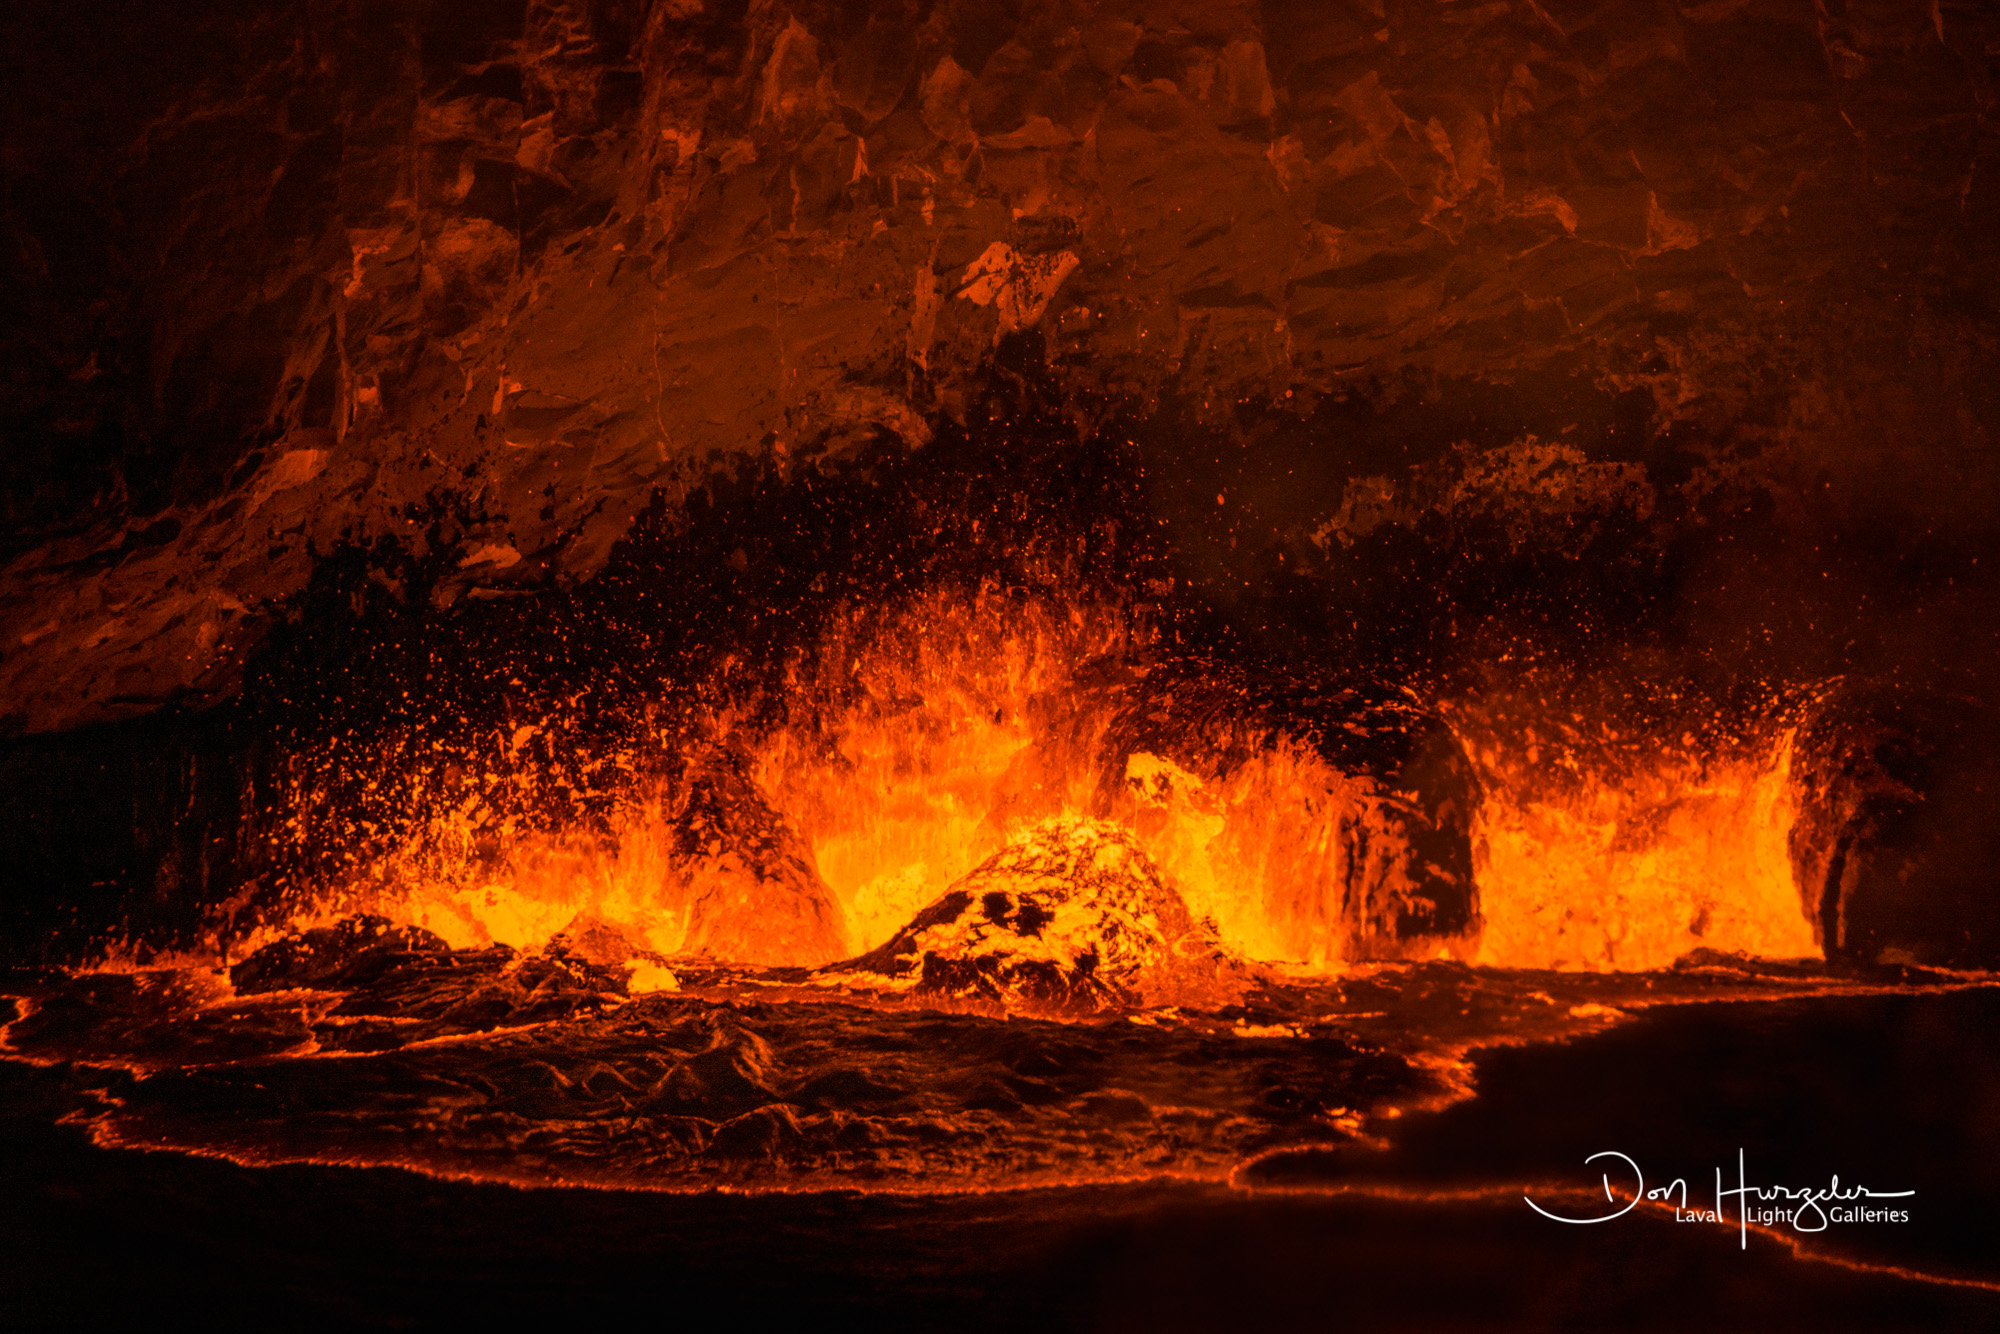 lava, lava flow, Kilauea, volcano, Hawaii eruption, photo